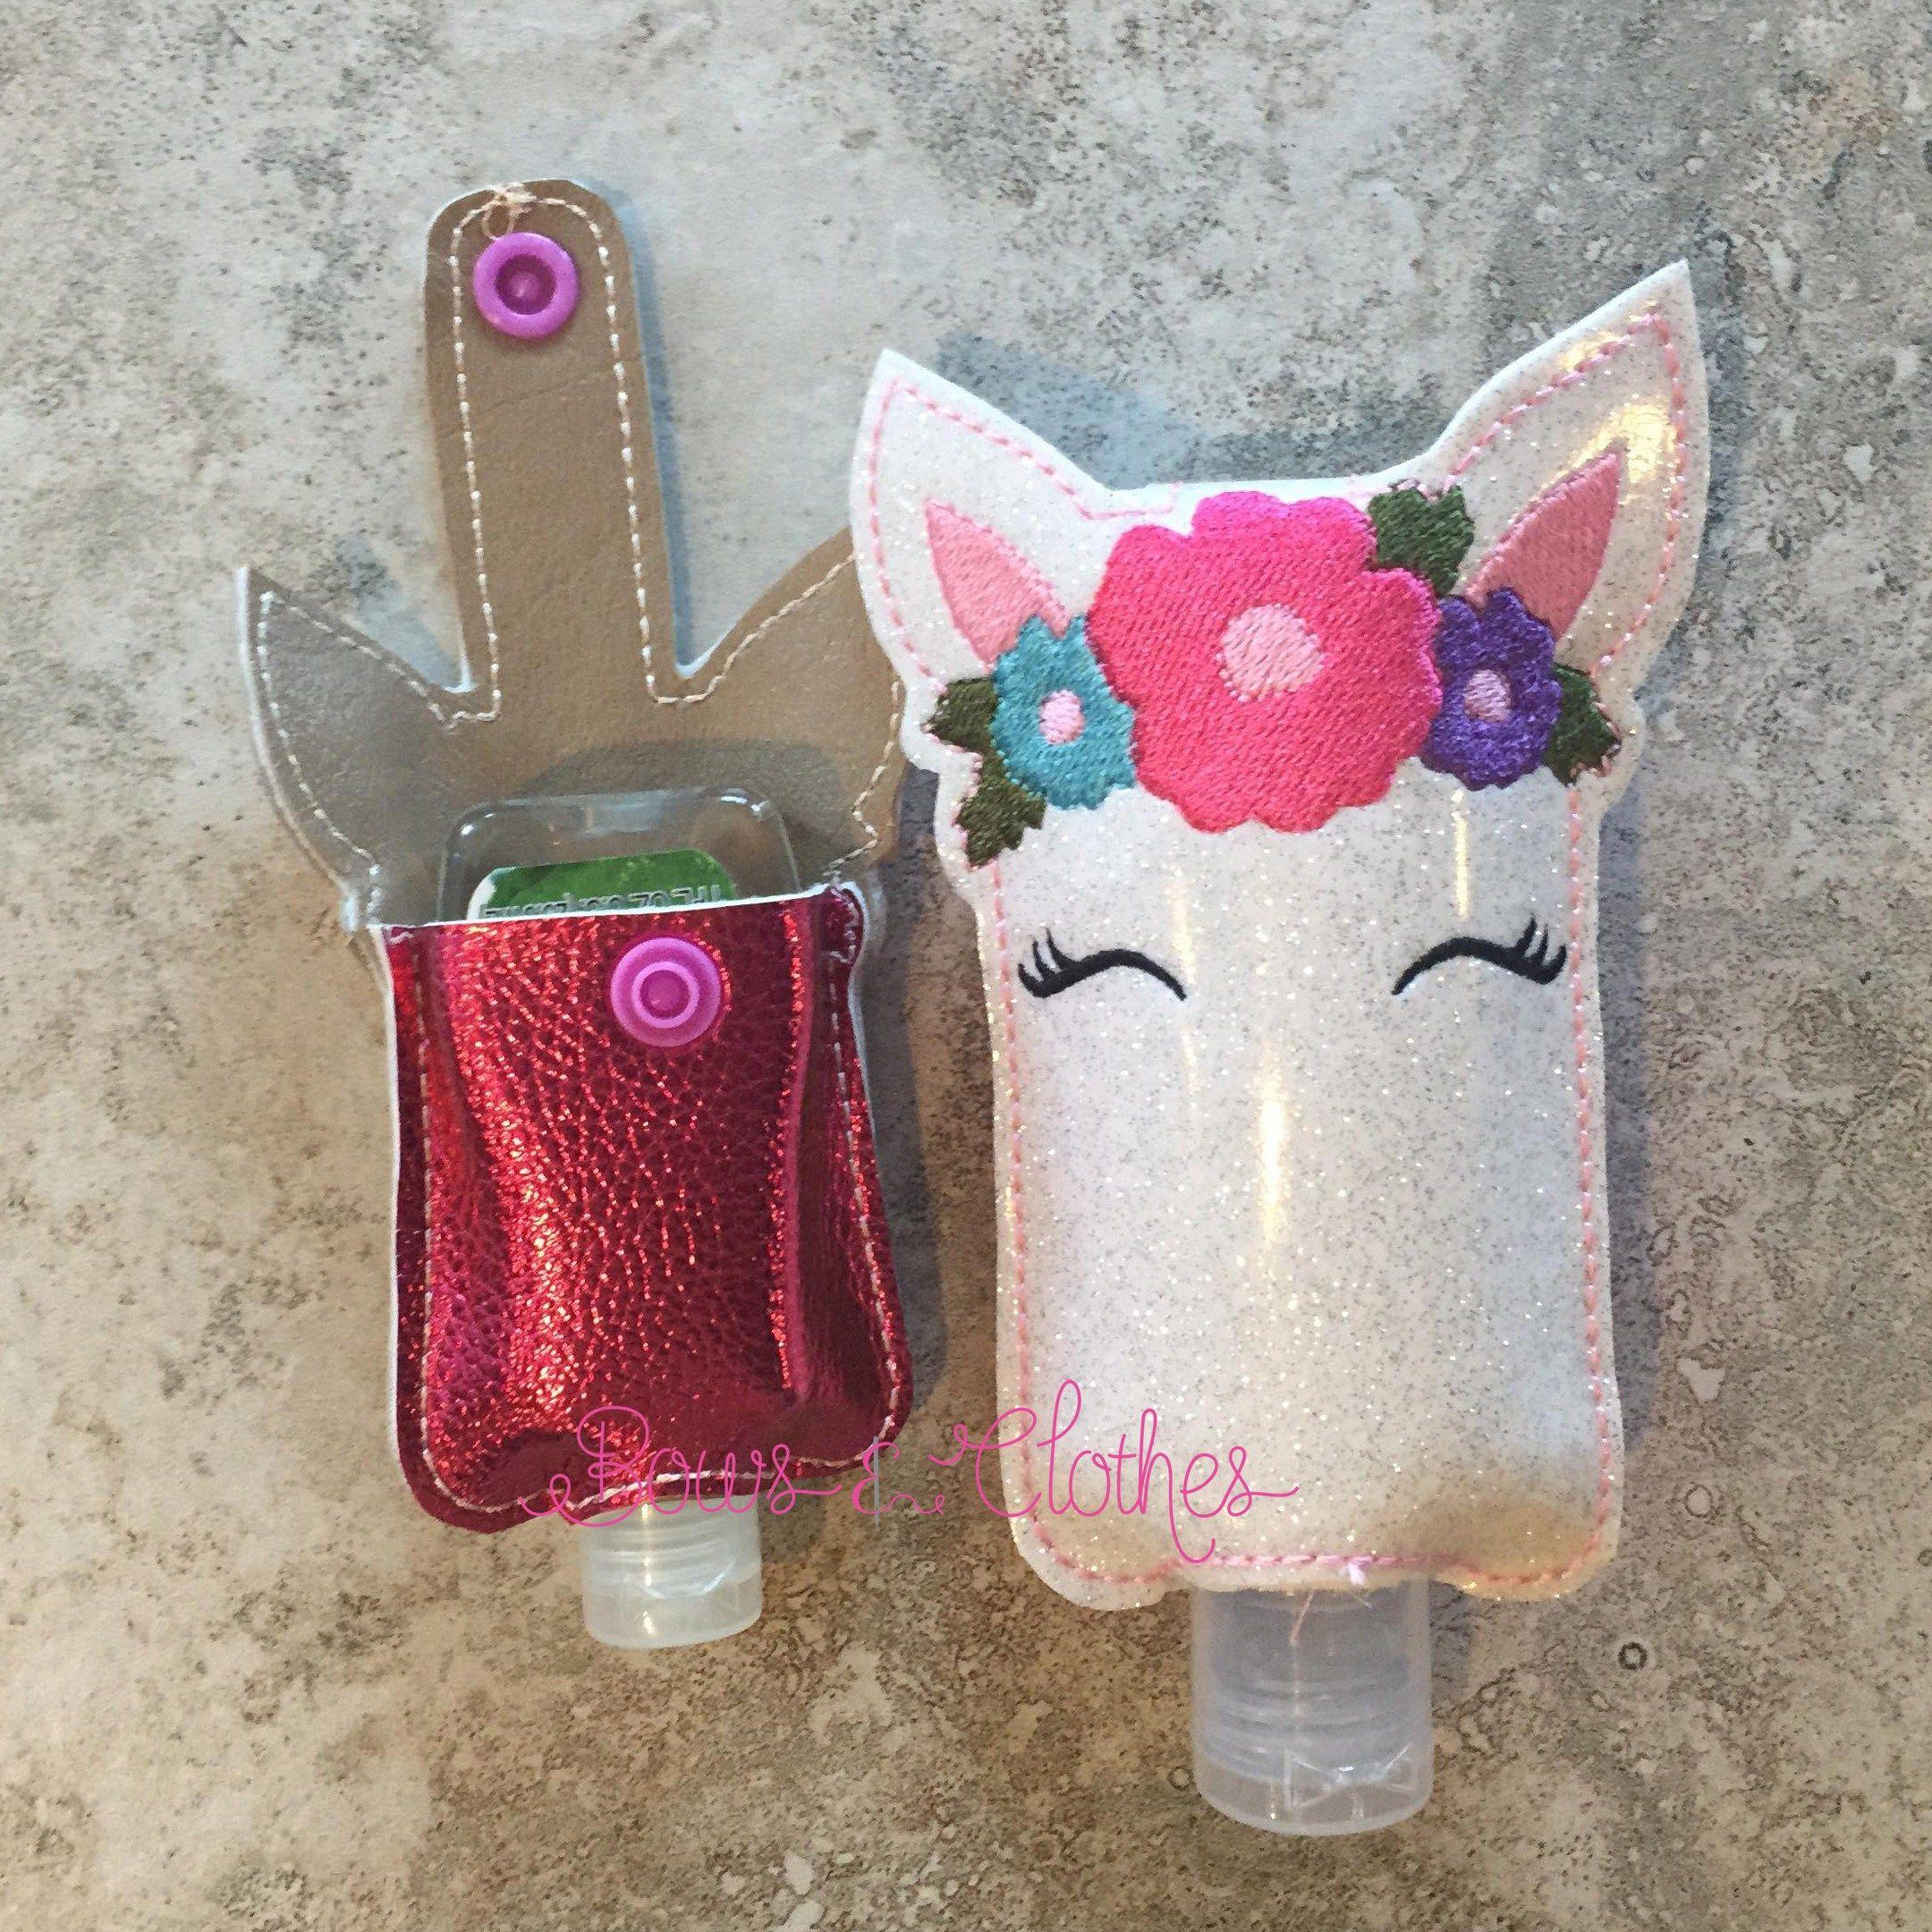 I Found This Cute Pinata Hand Sanitizer Holder At Bath Body